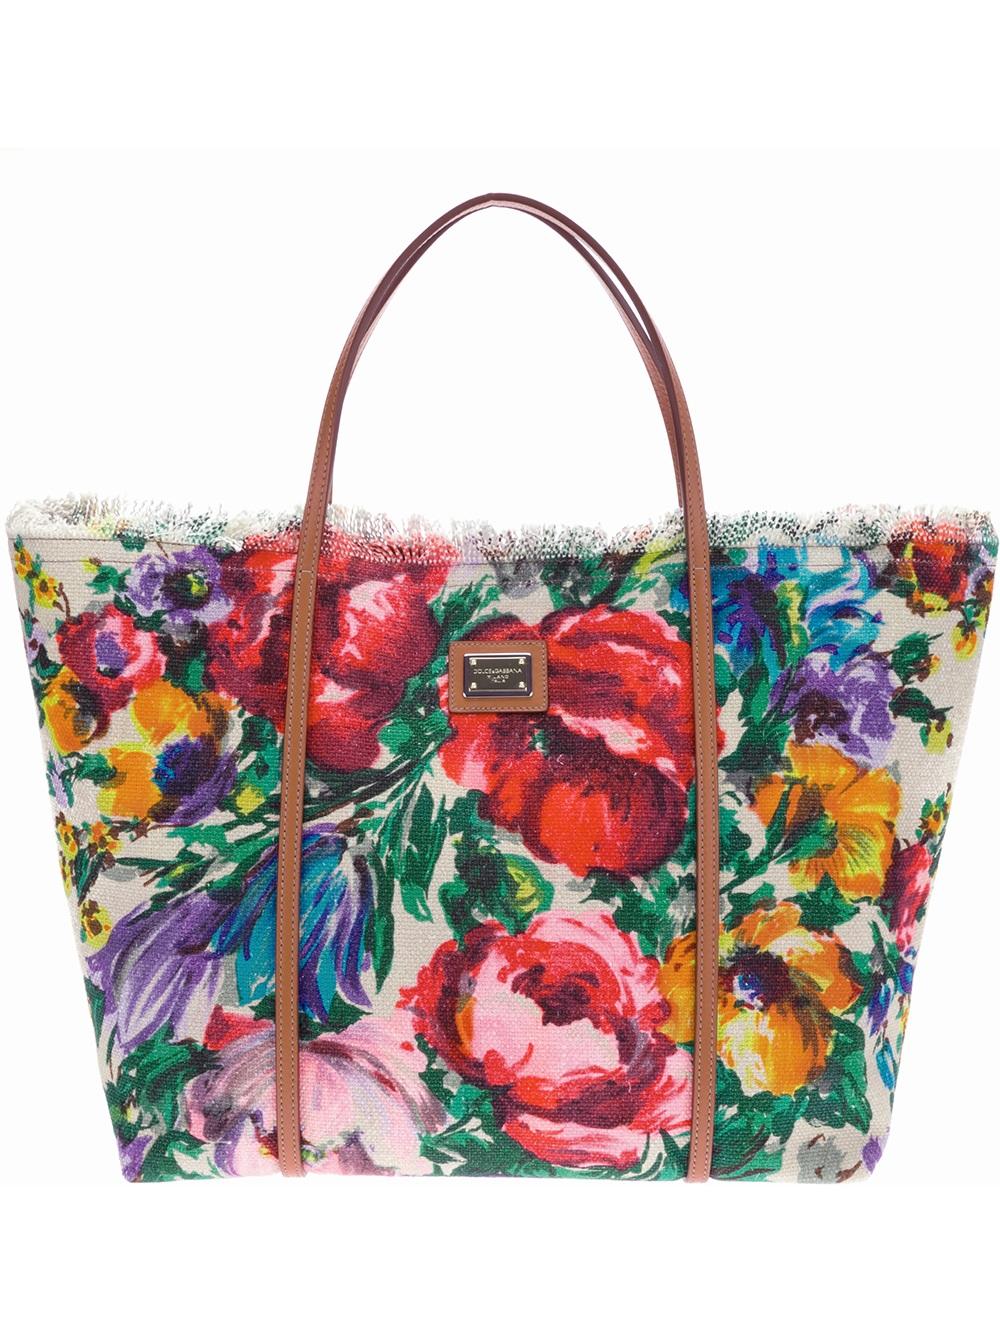 d98066cf262b Lyst - Dolce   Gabbana Floral Tote